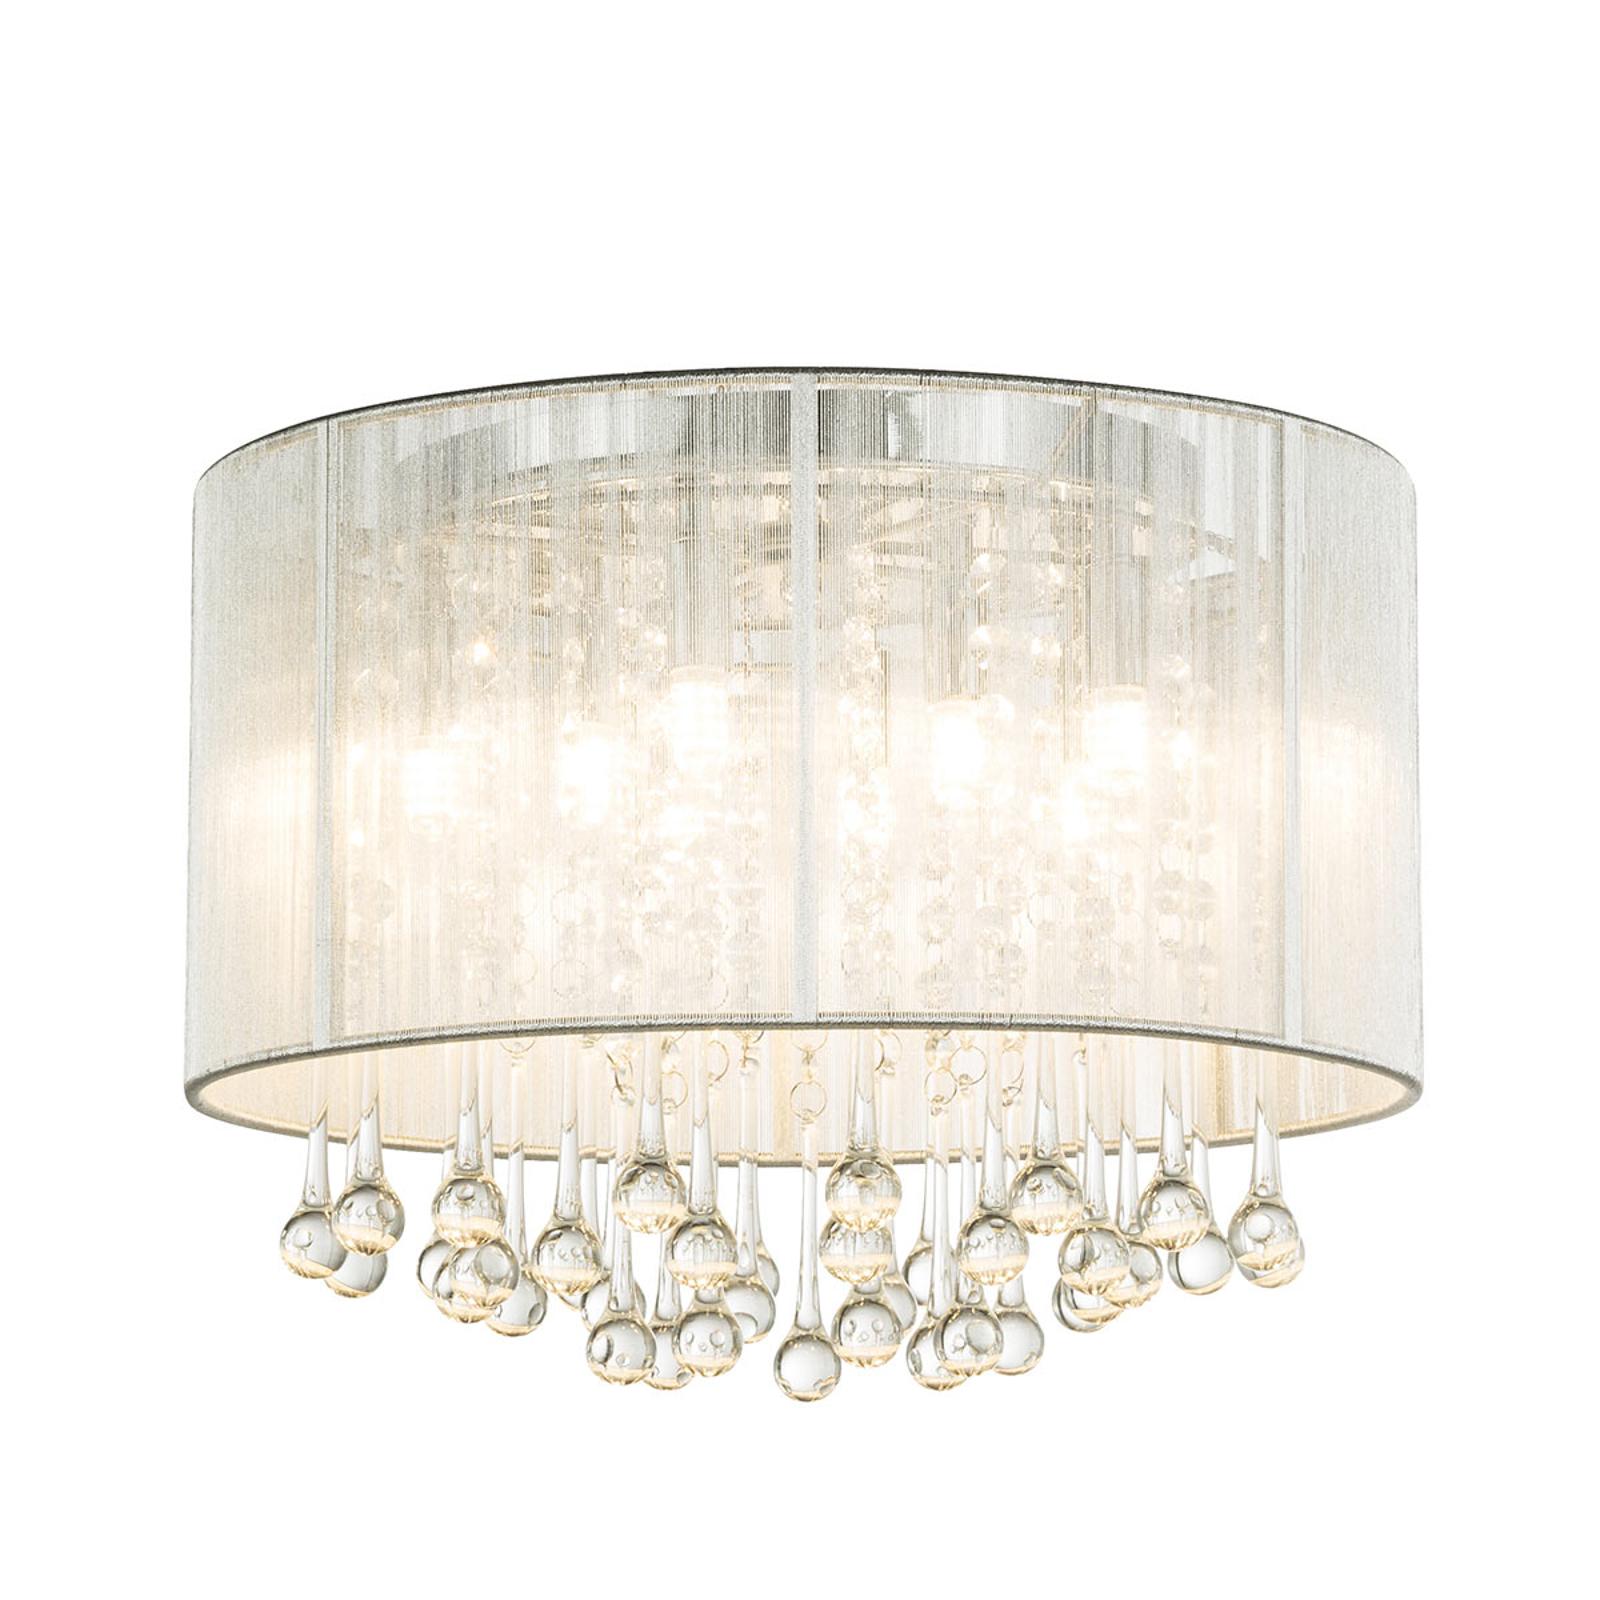 Sølvfarget LED-taklampe Sierra med anheng